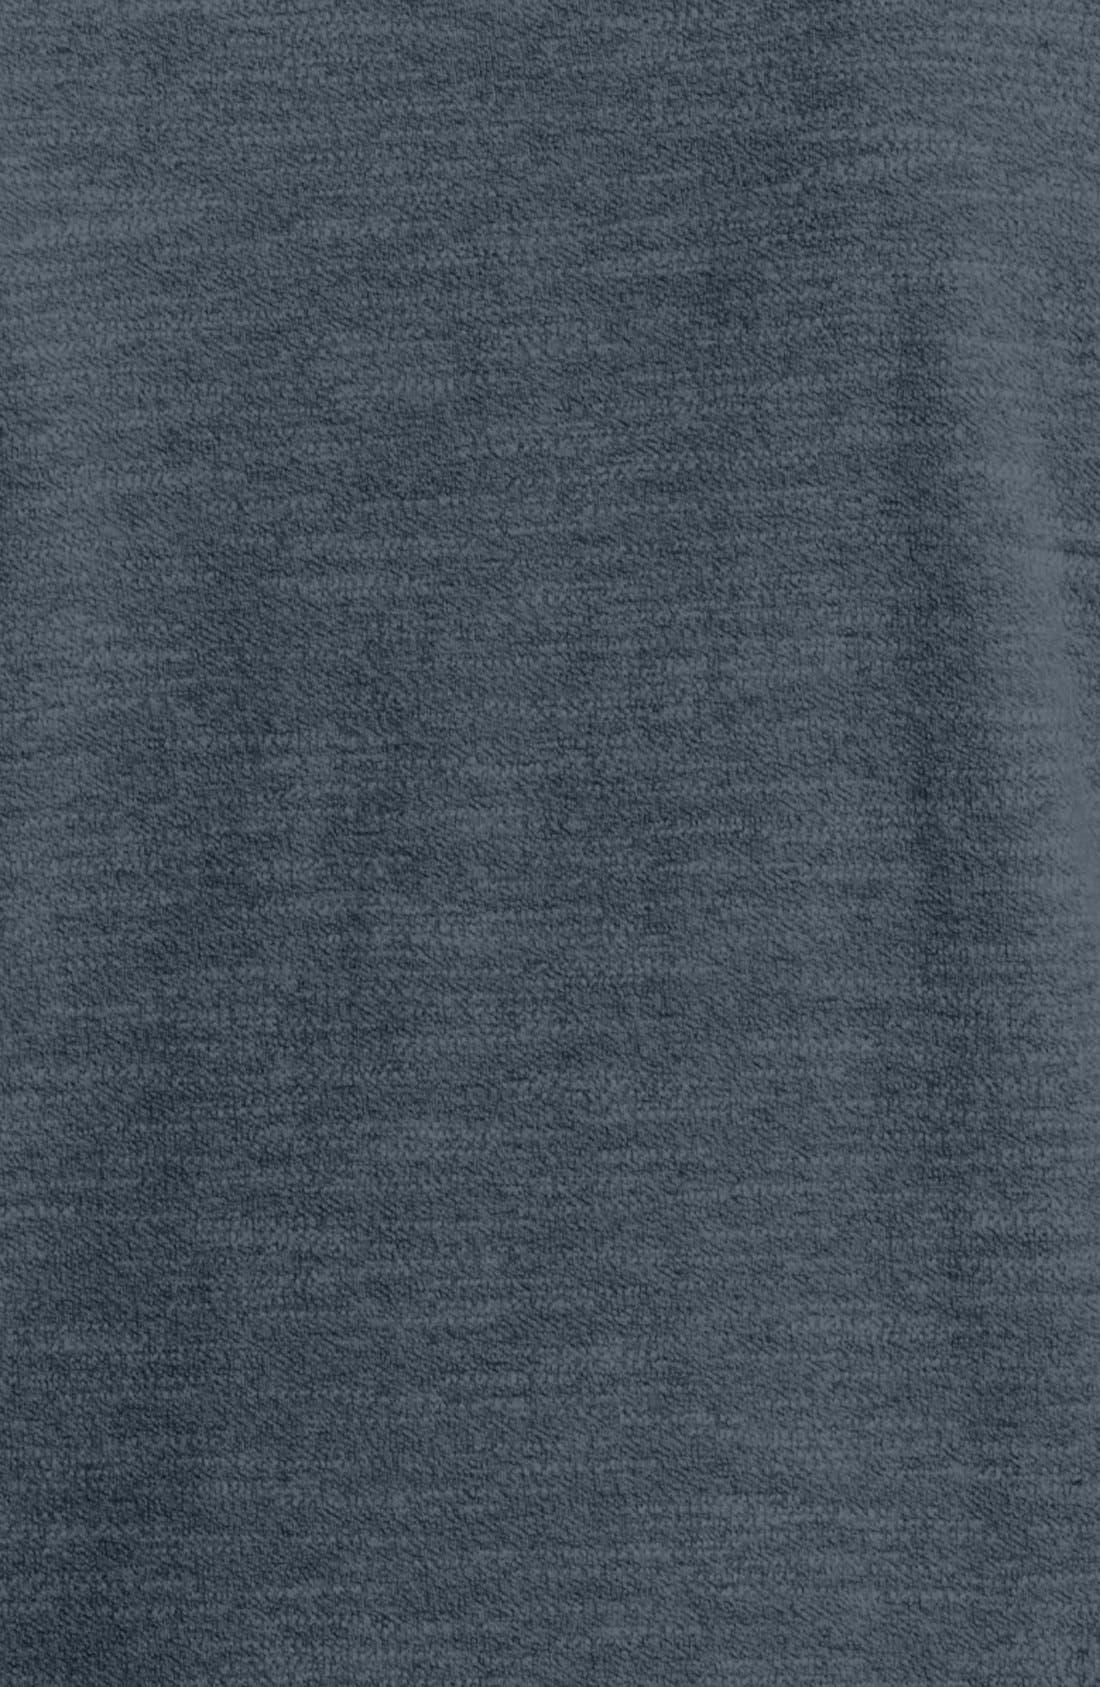 Alternate Image 3  - rag & bone 'Moulinex' Crewneck Sweatshirt